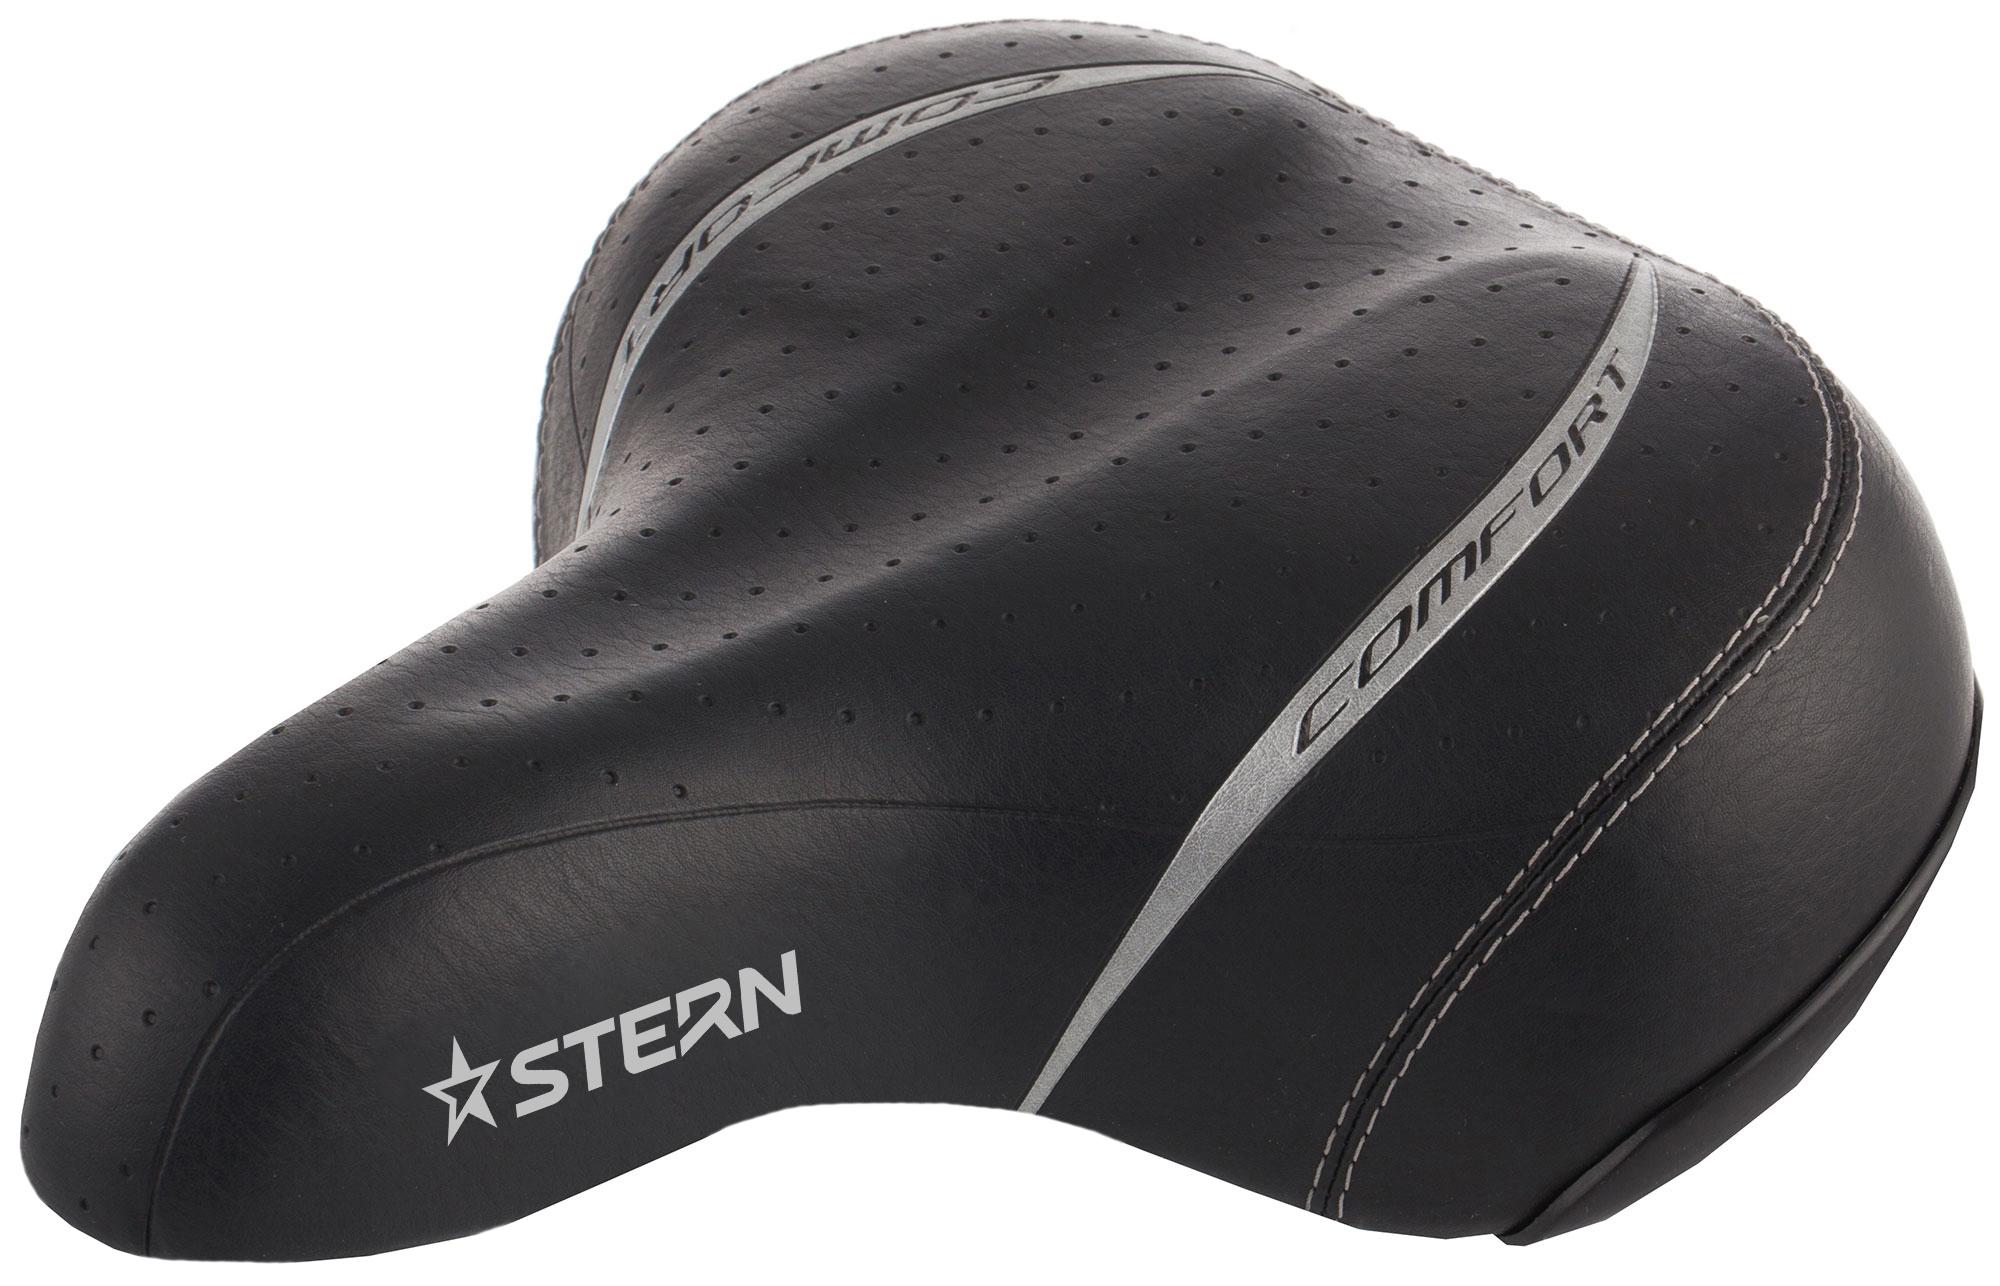 Stern Седло велосипедное Stern джерси велосипедное clmchill ssjsyw